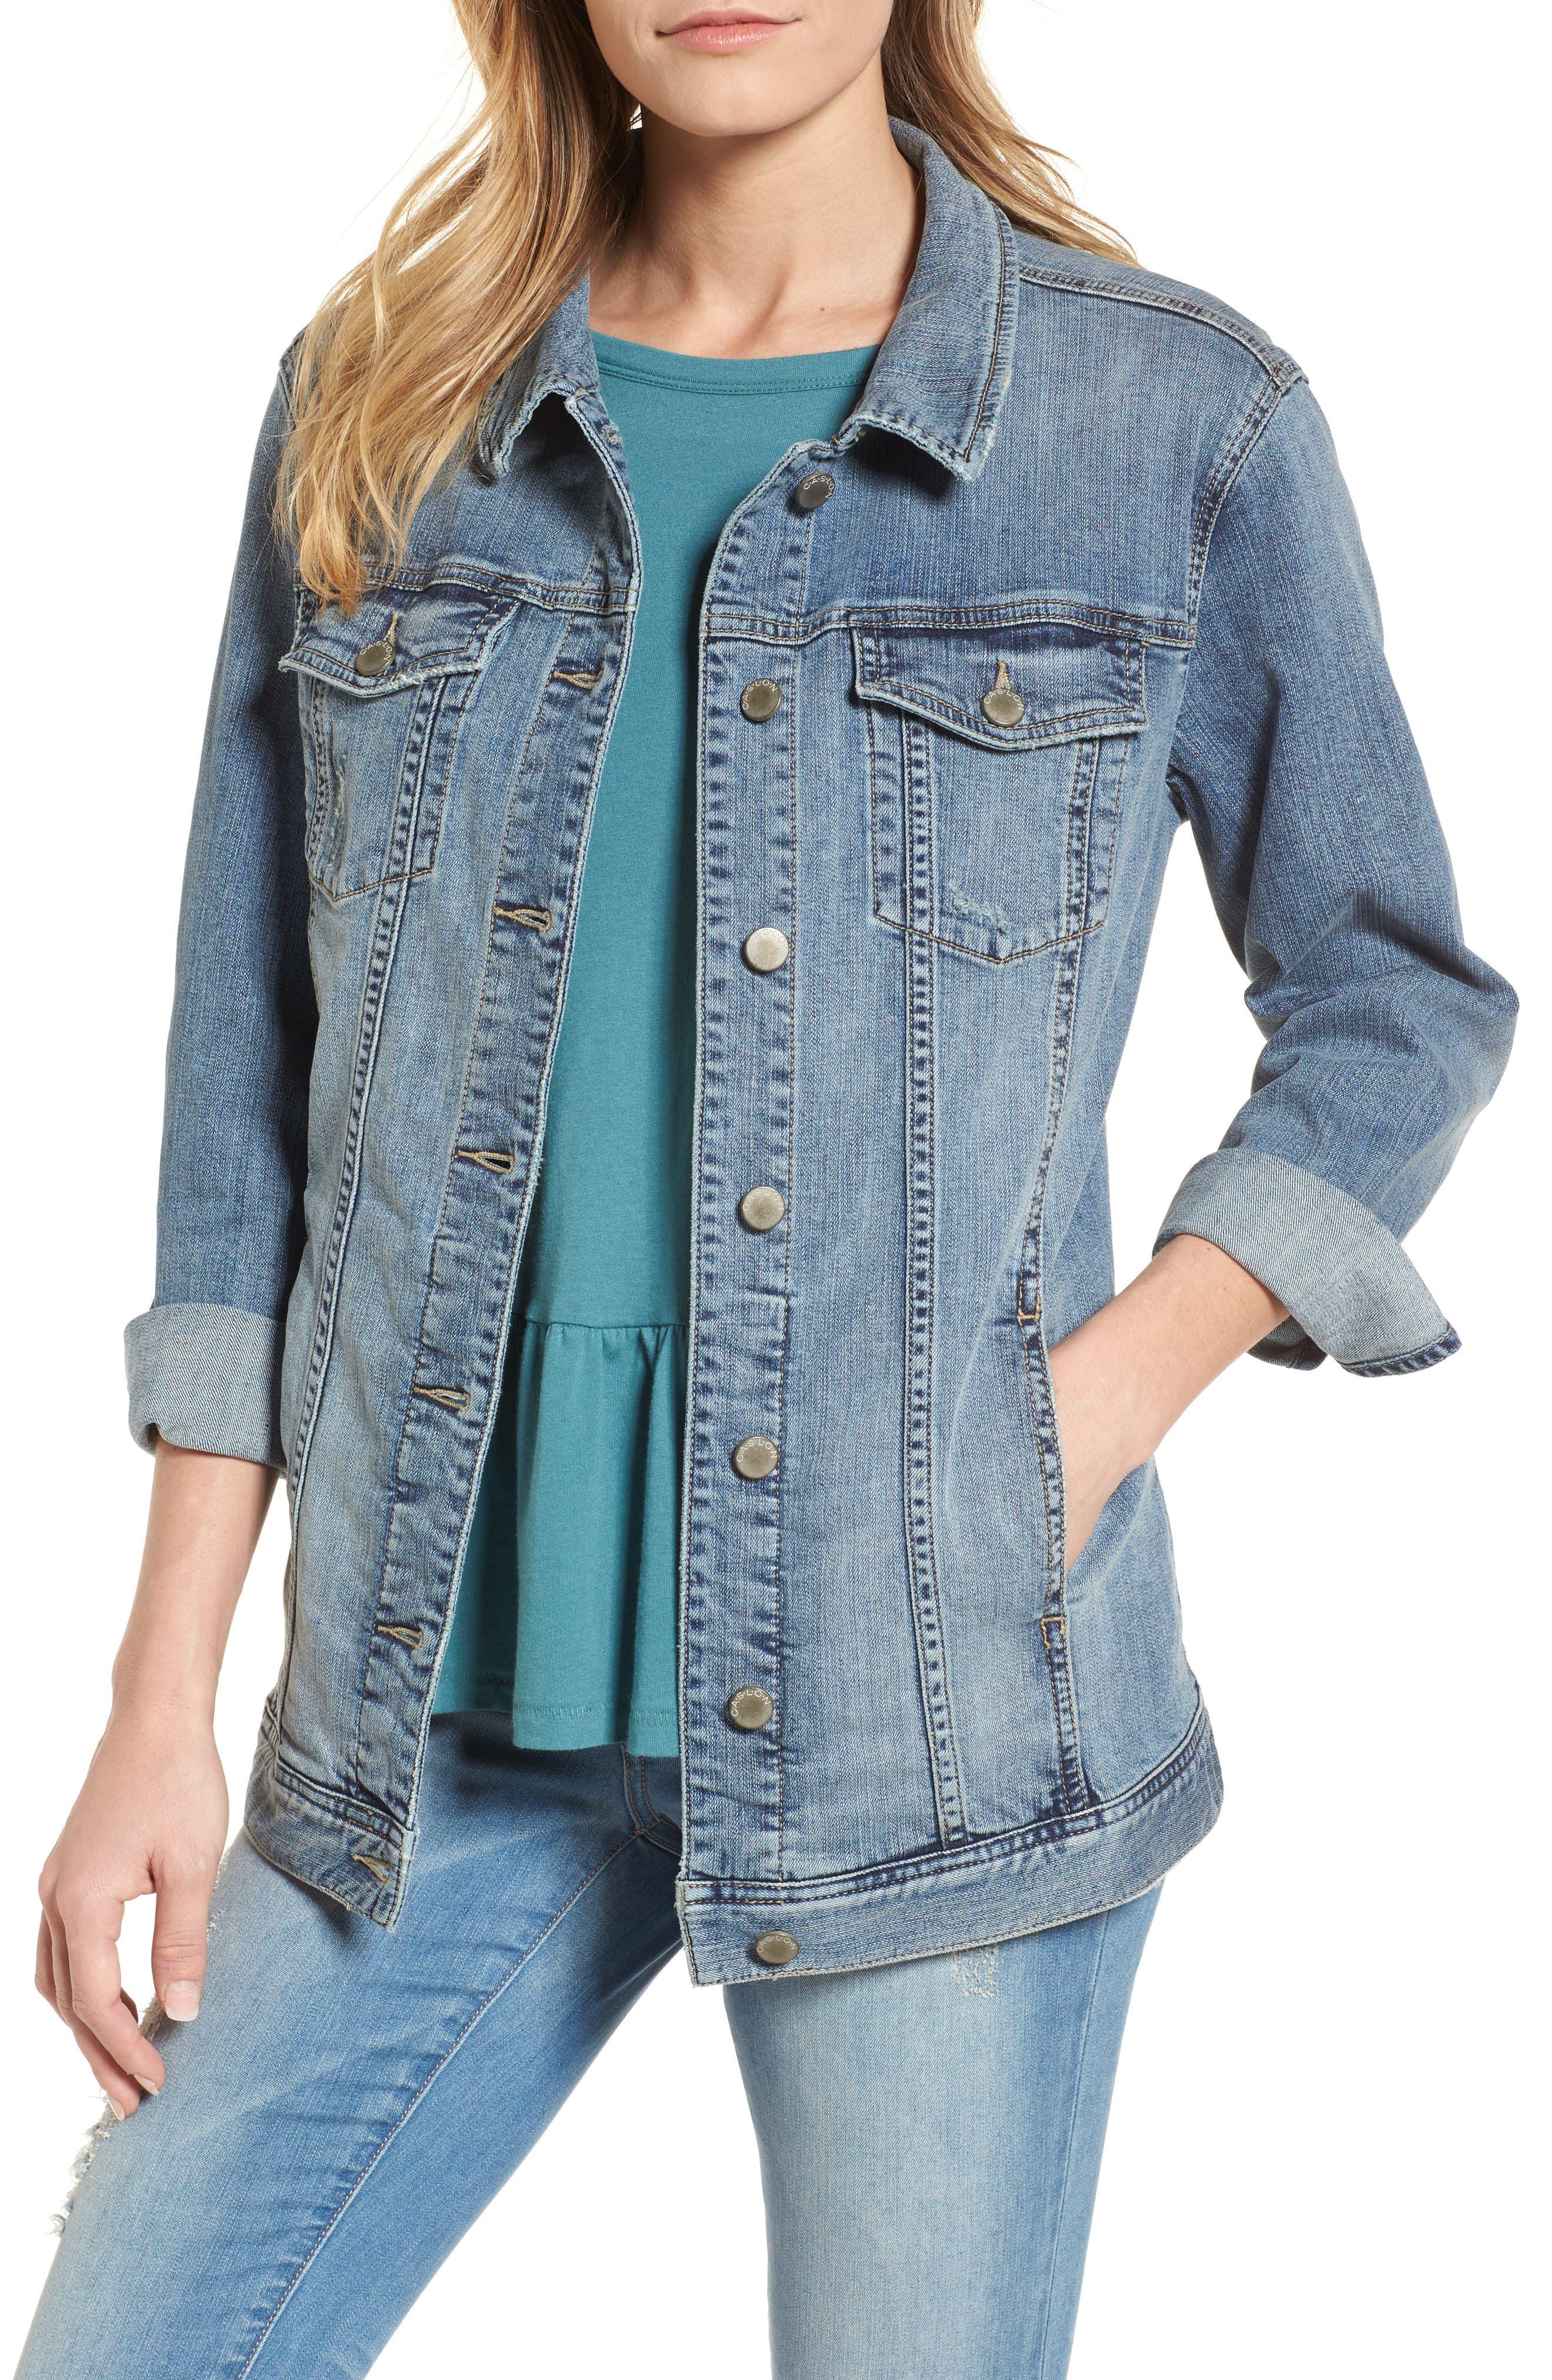 Alternate Image 1 Selected - Caslon® Relaxed Fit Denim Jacket (Regular & Petite)